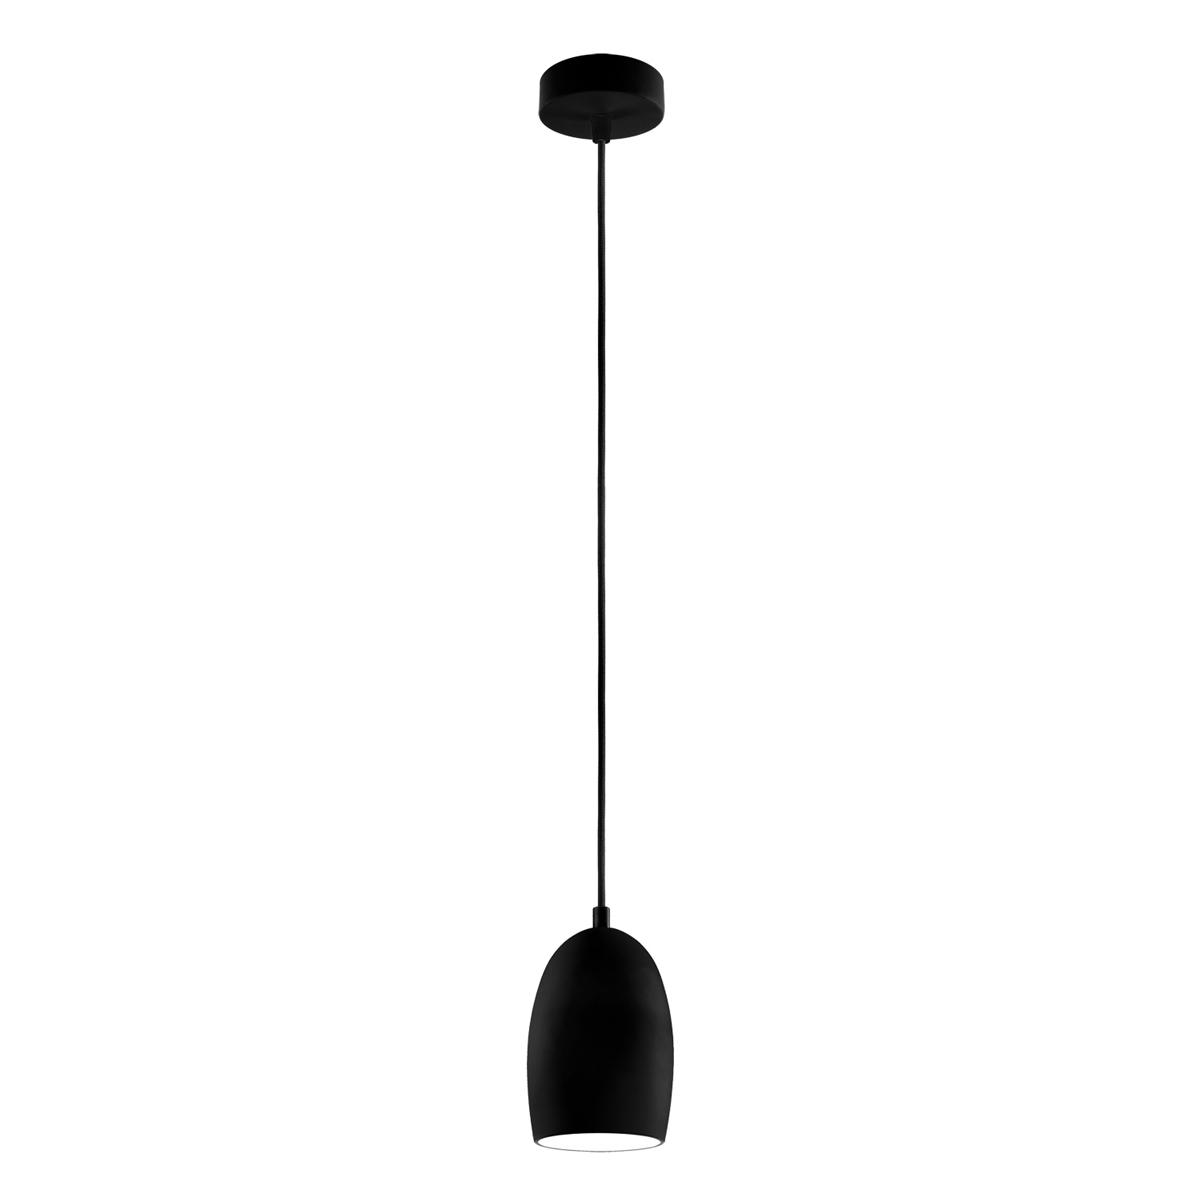 Petite suspension noire